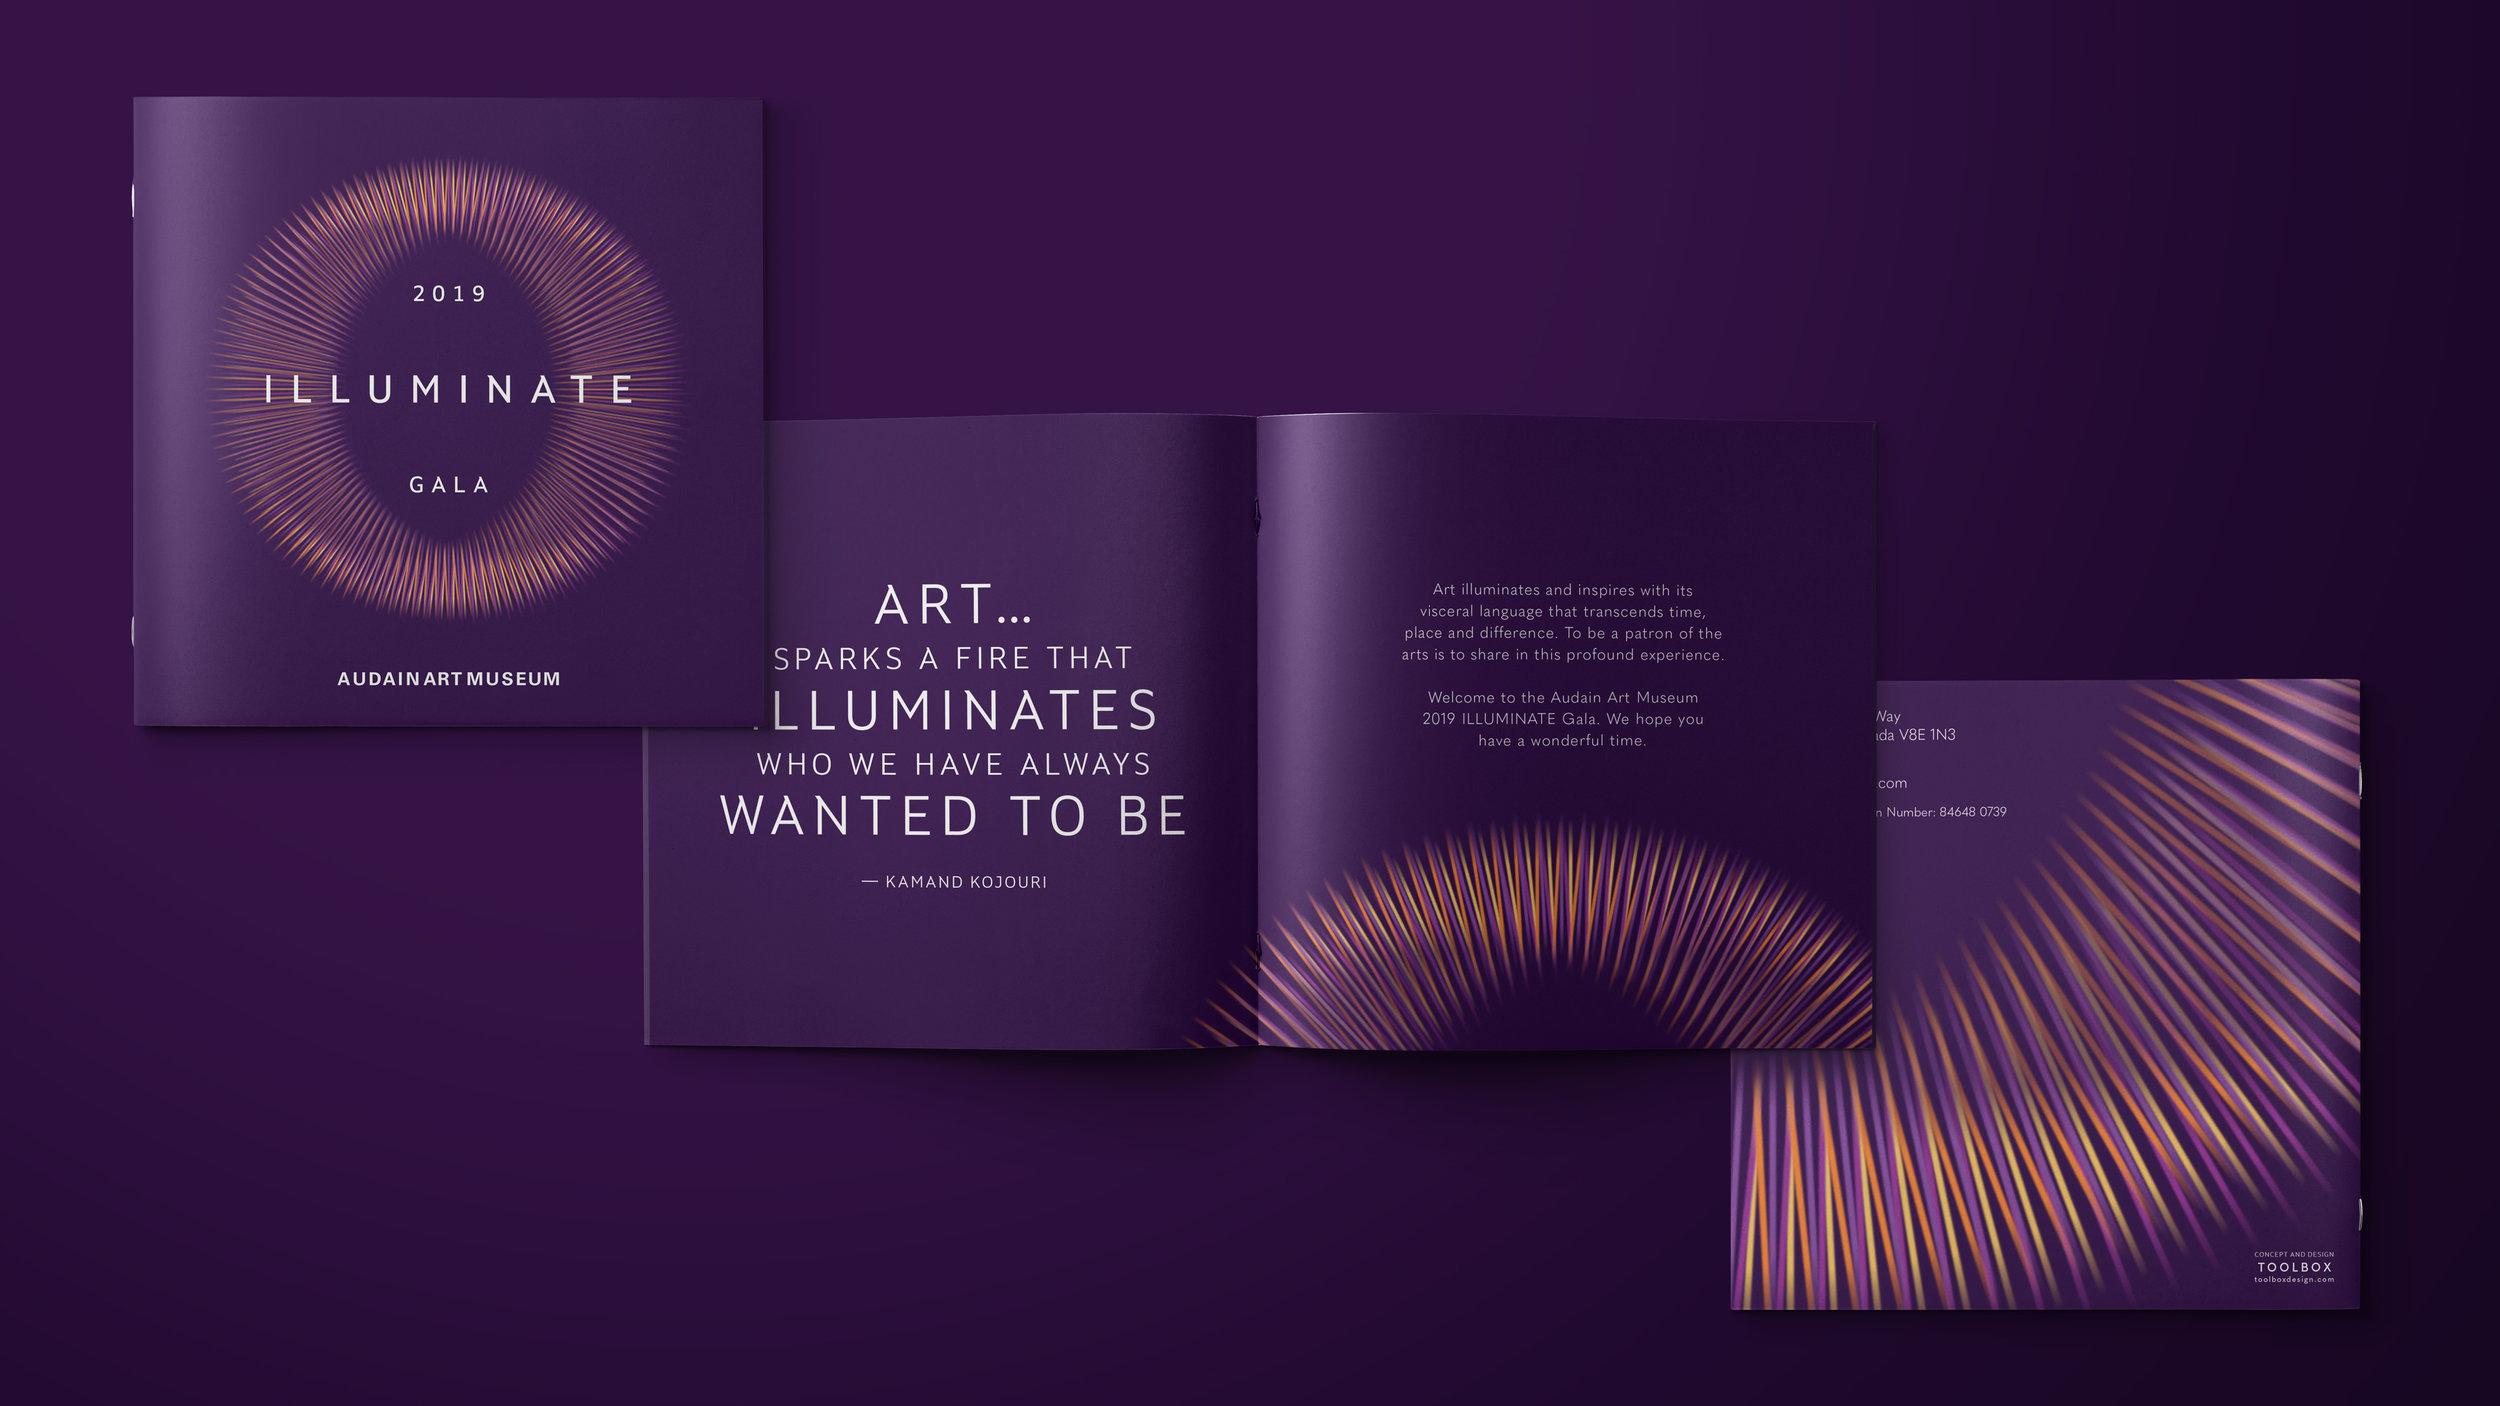 Markus-Wreland-Illuminate-Gala-2019-02.jpg